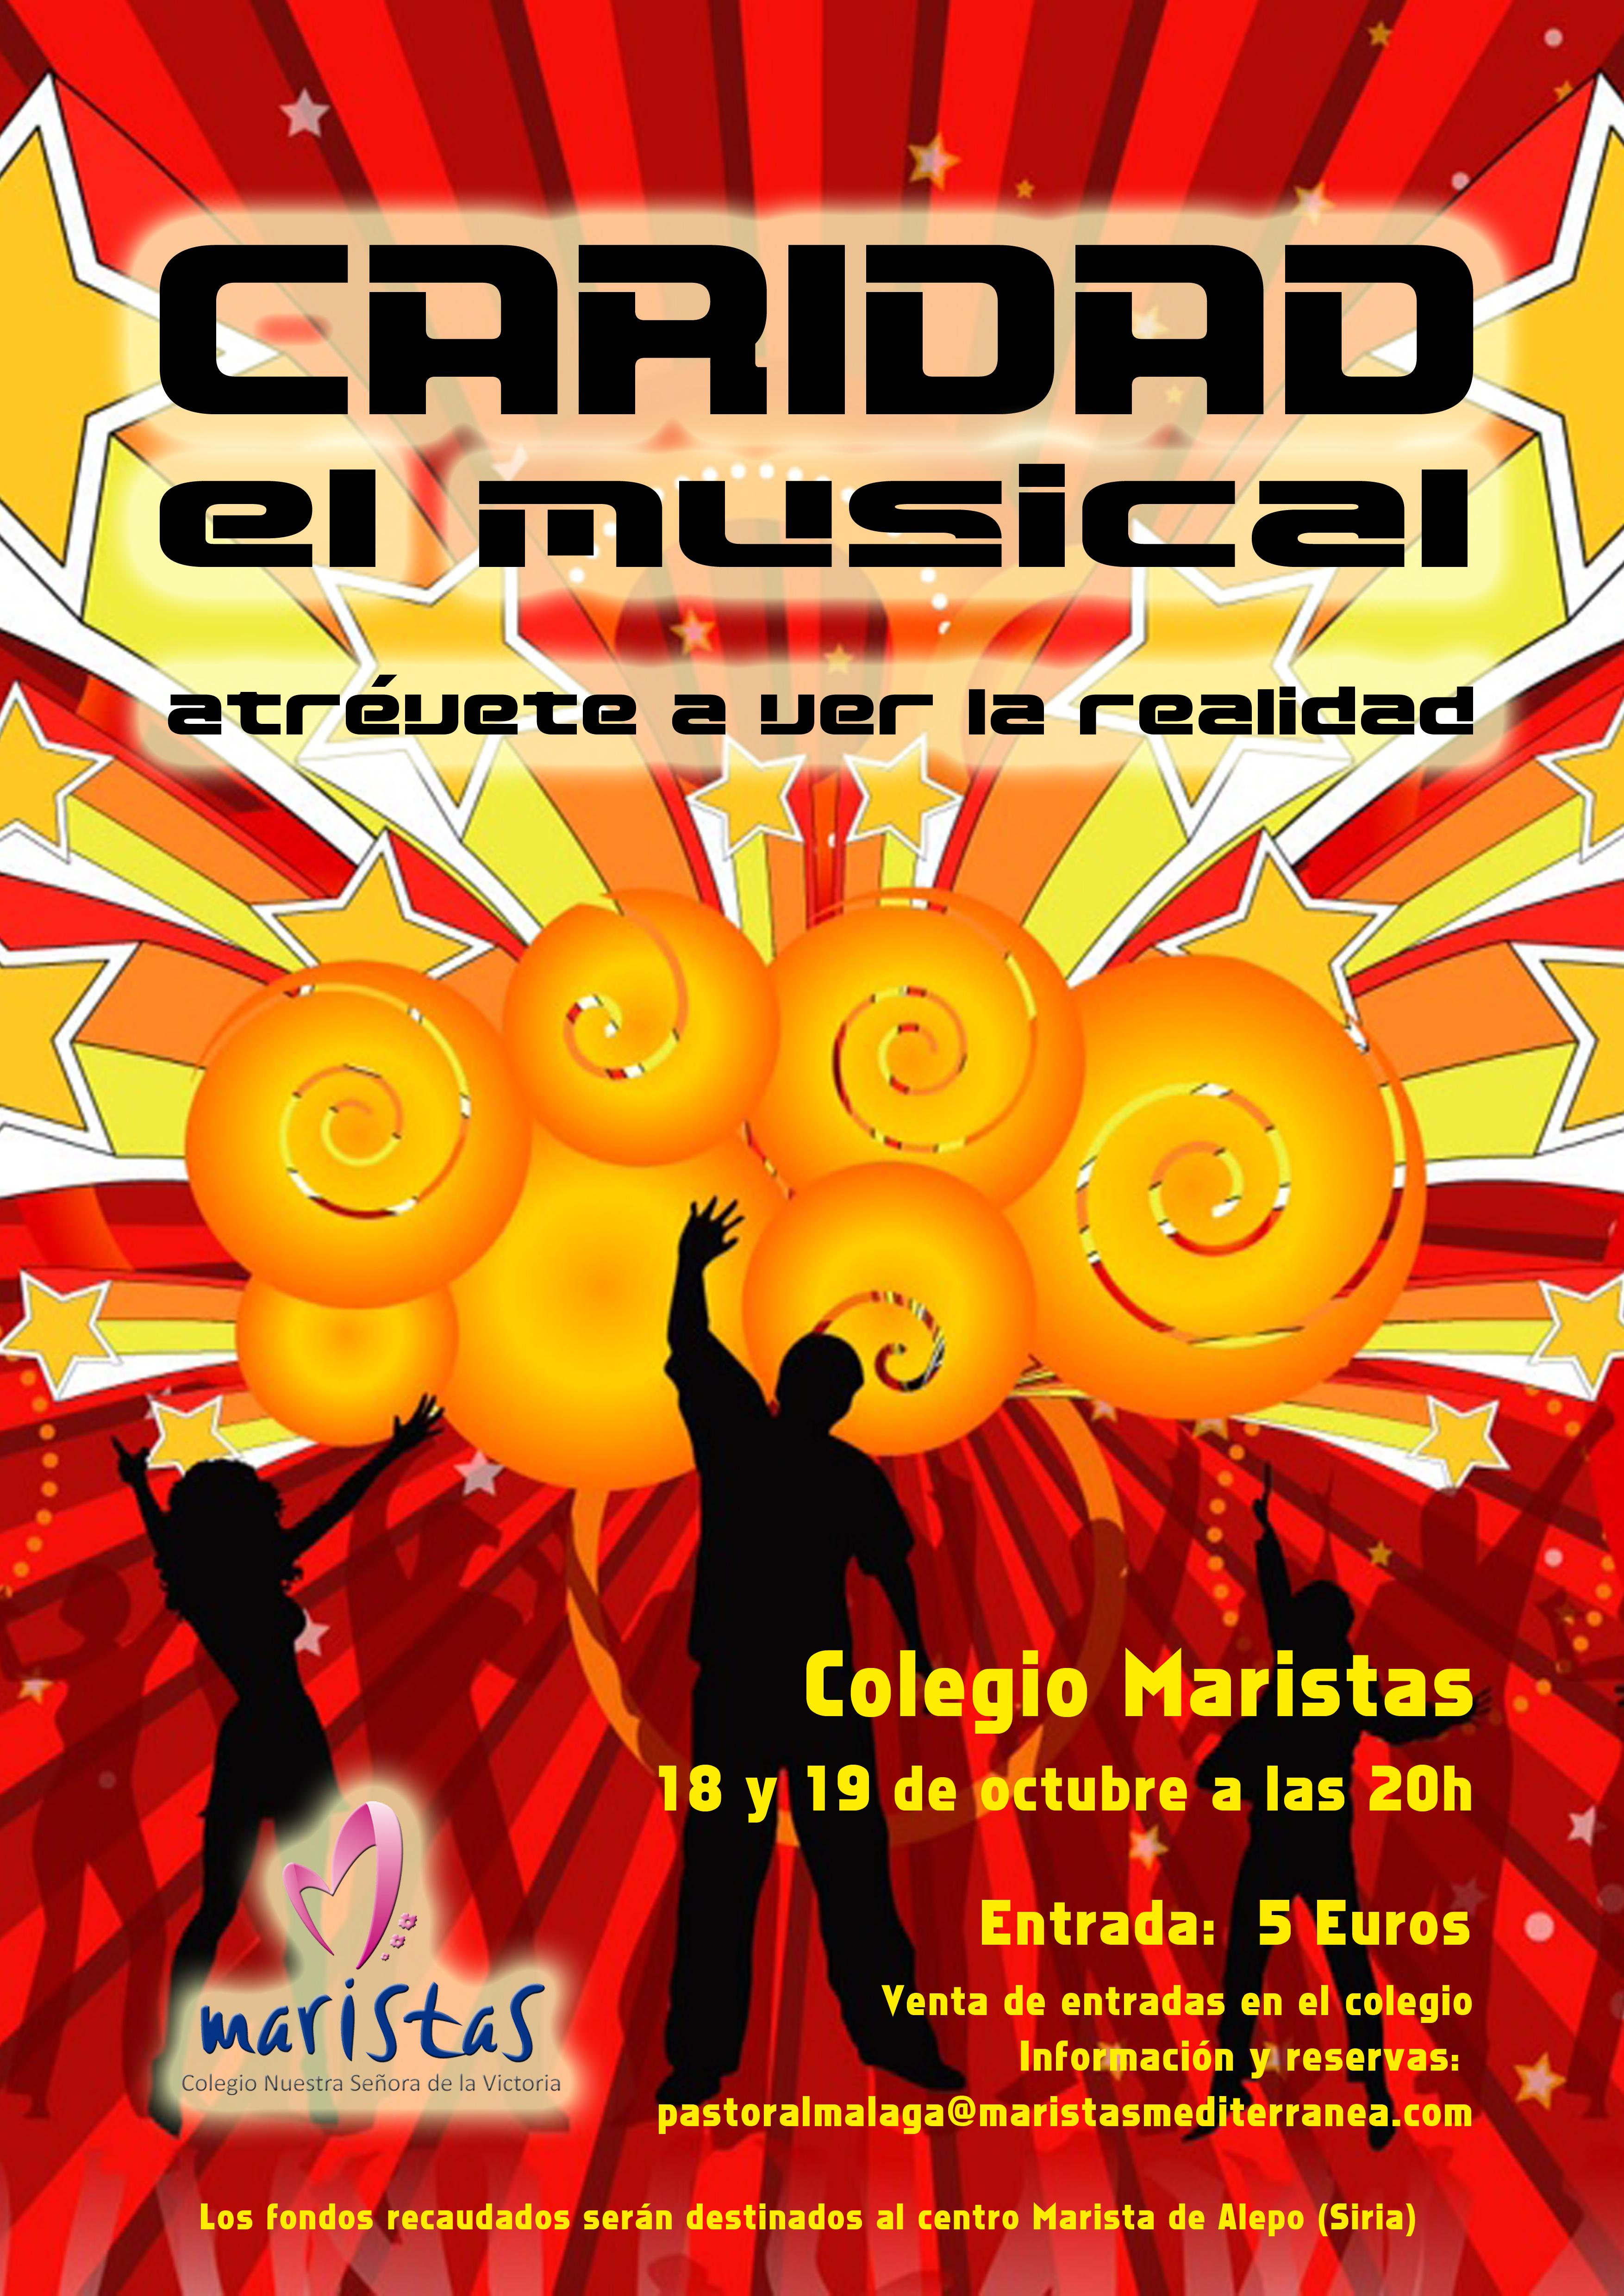 cartel musical caridad